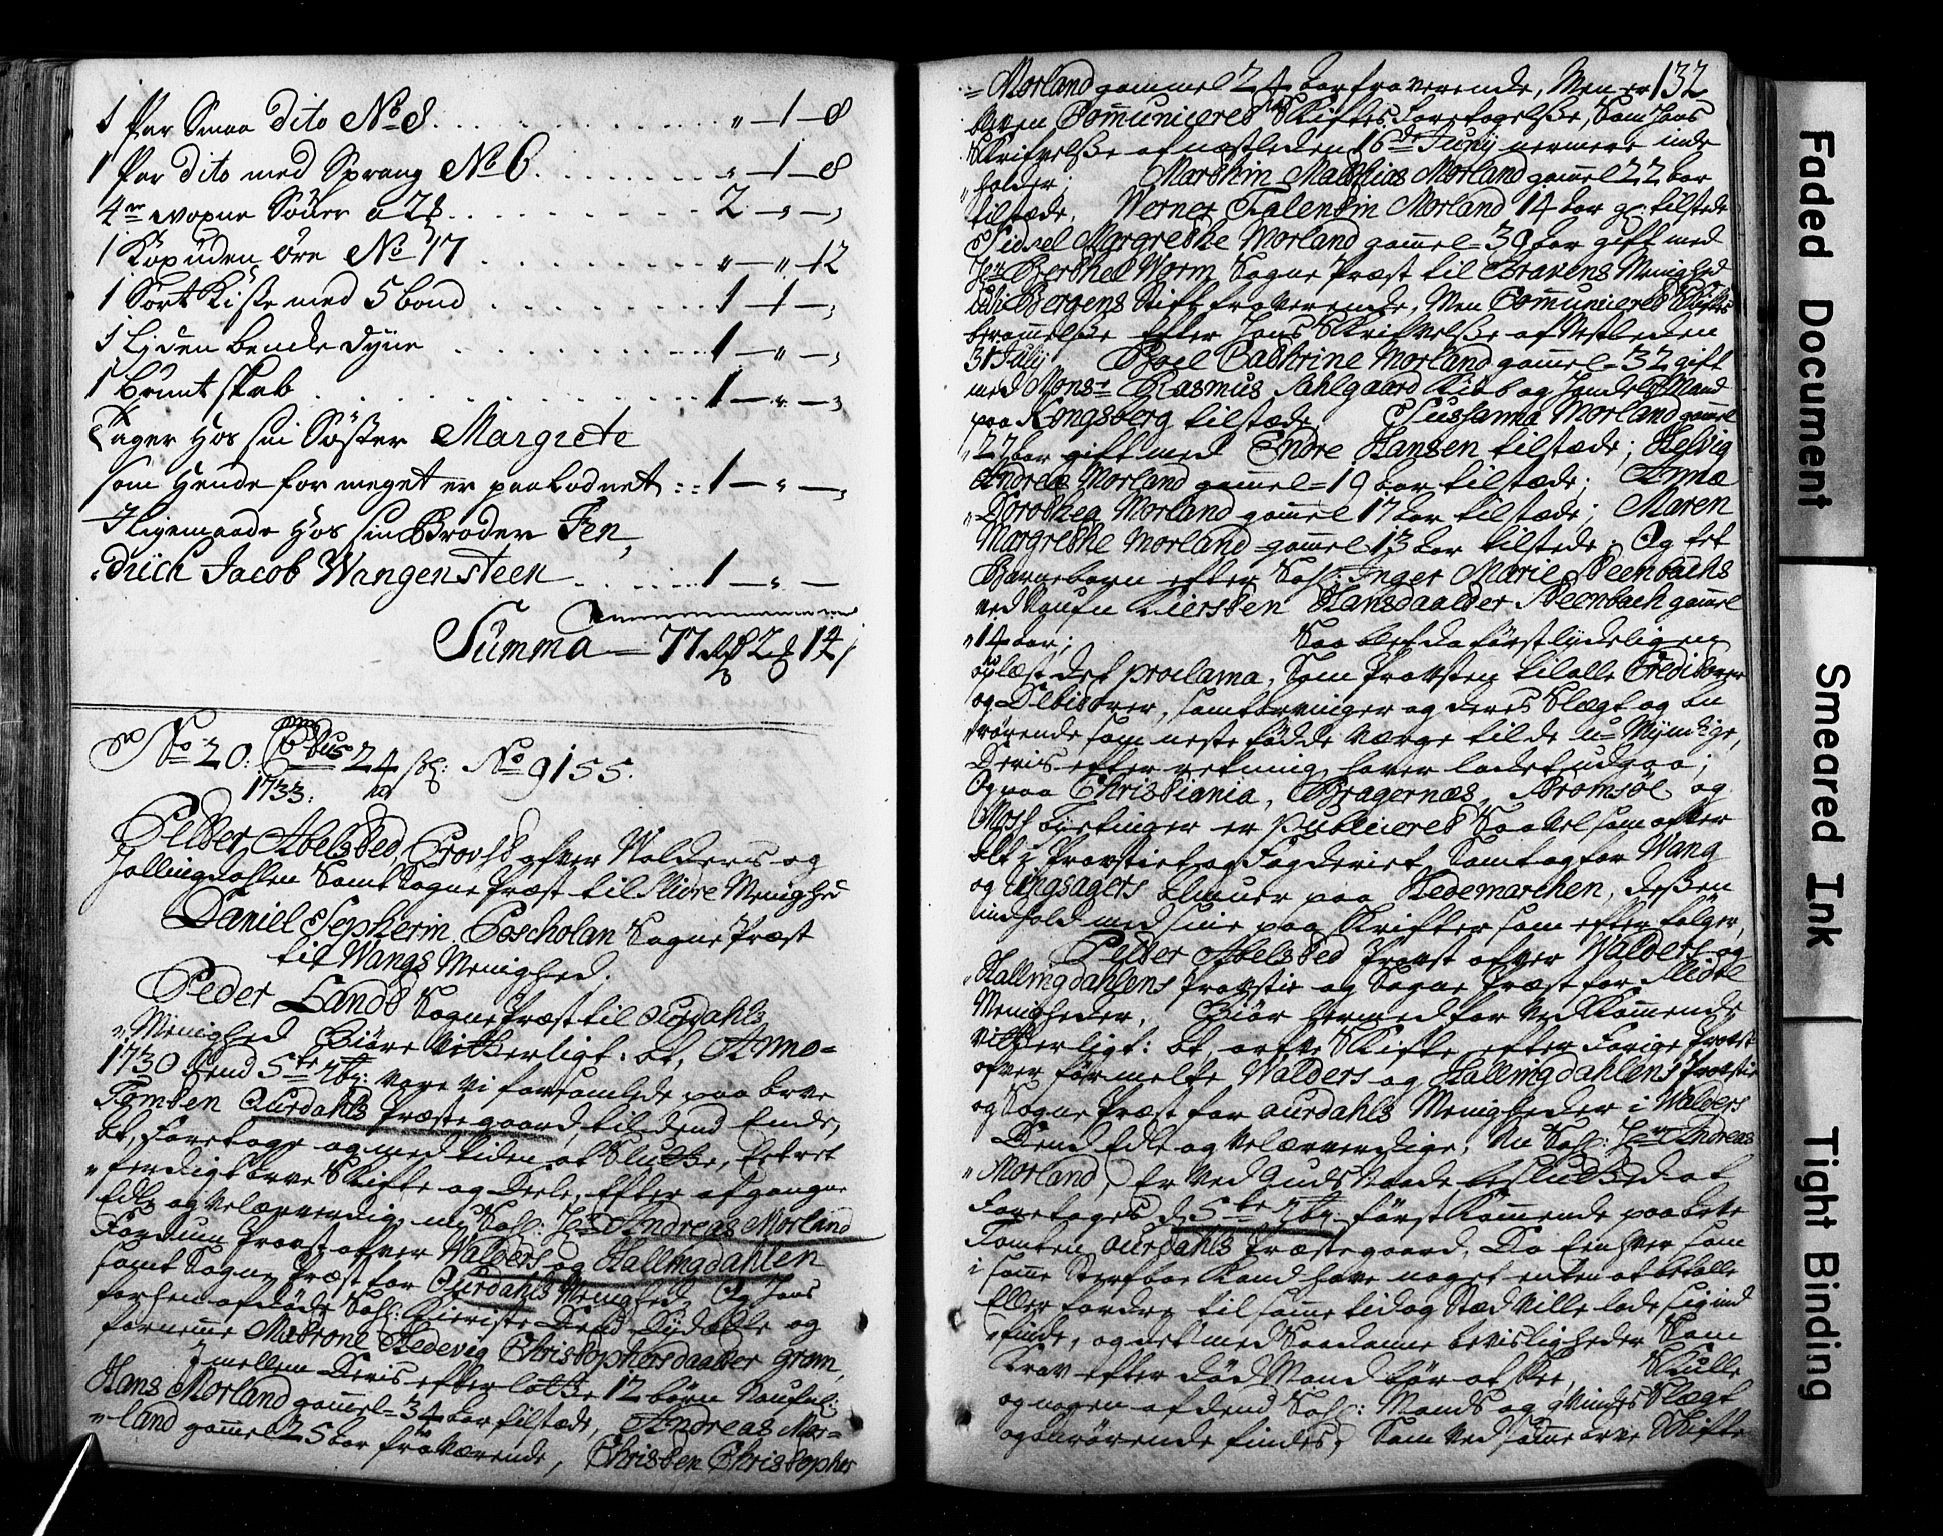 SAH, Valdres og Hallingdal prosti, G/Ga/L0001: Skifteprotokoll, geistlige skifter, 1716-1736, s. 131b-132a